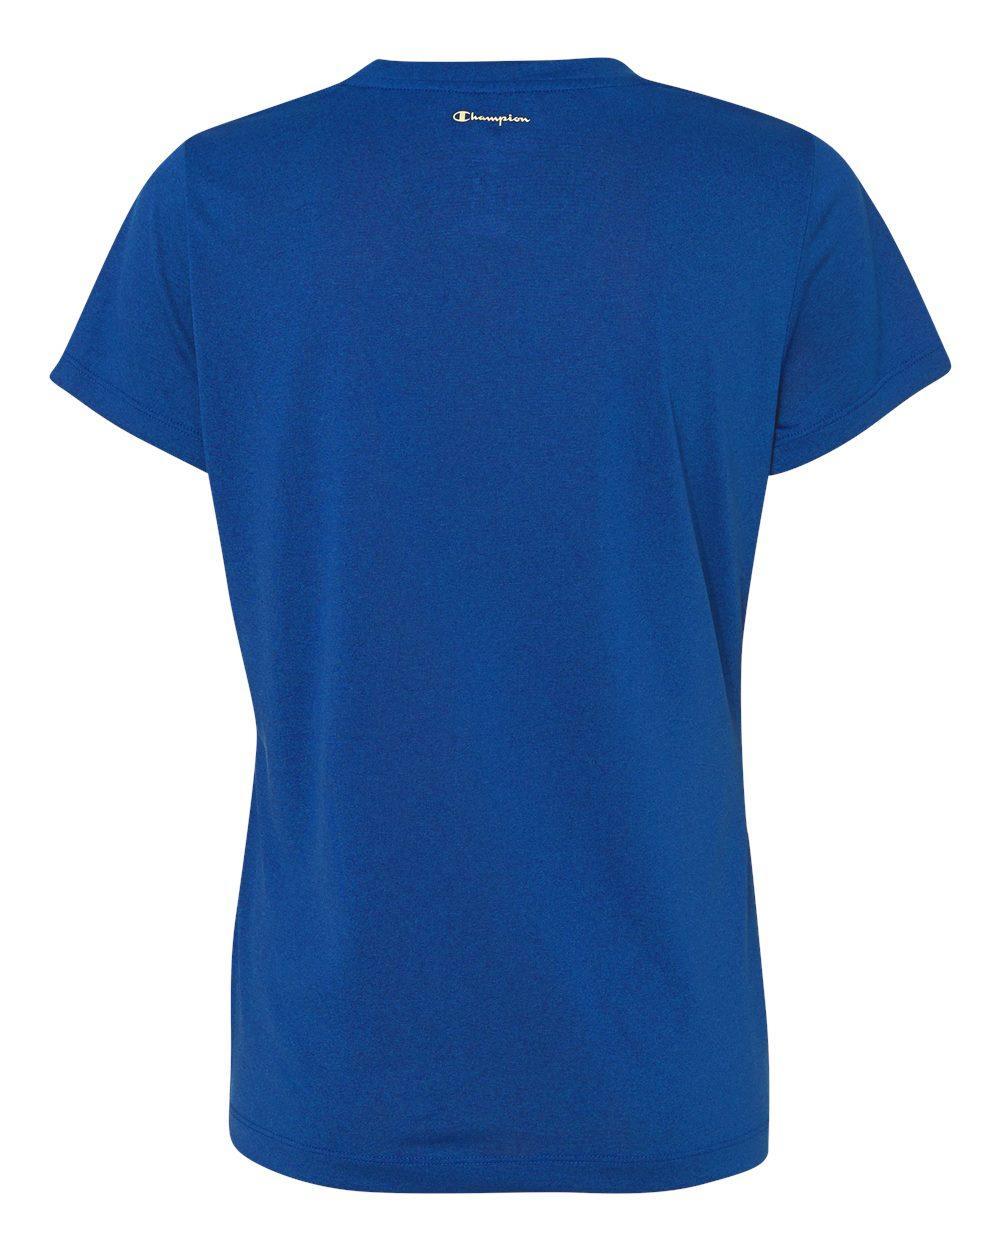 Champion - Vapor Women's Performance Heather T-Shirt - CV30